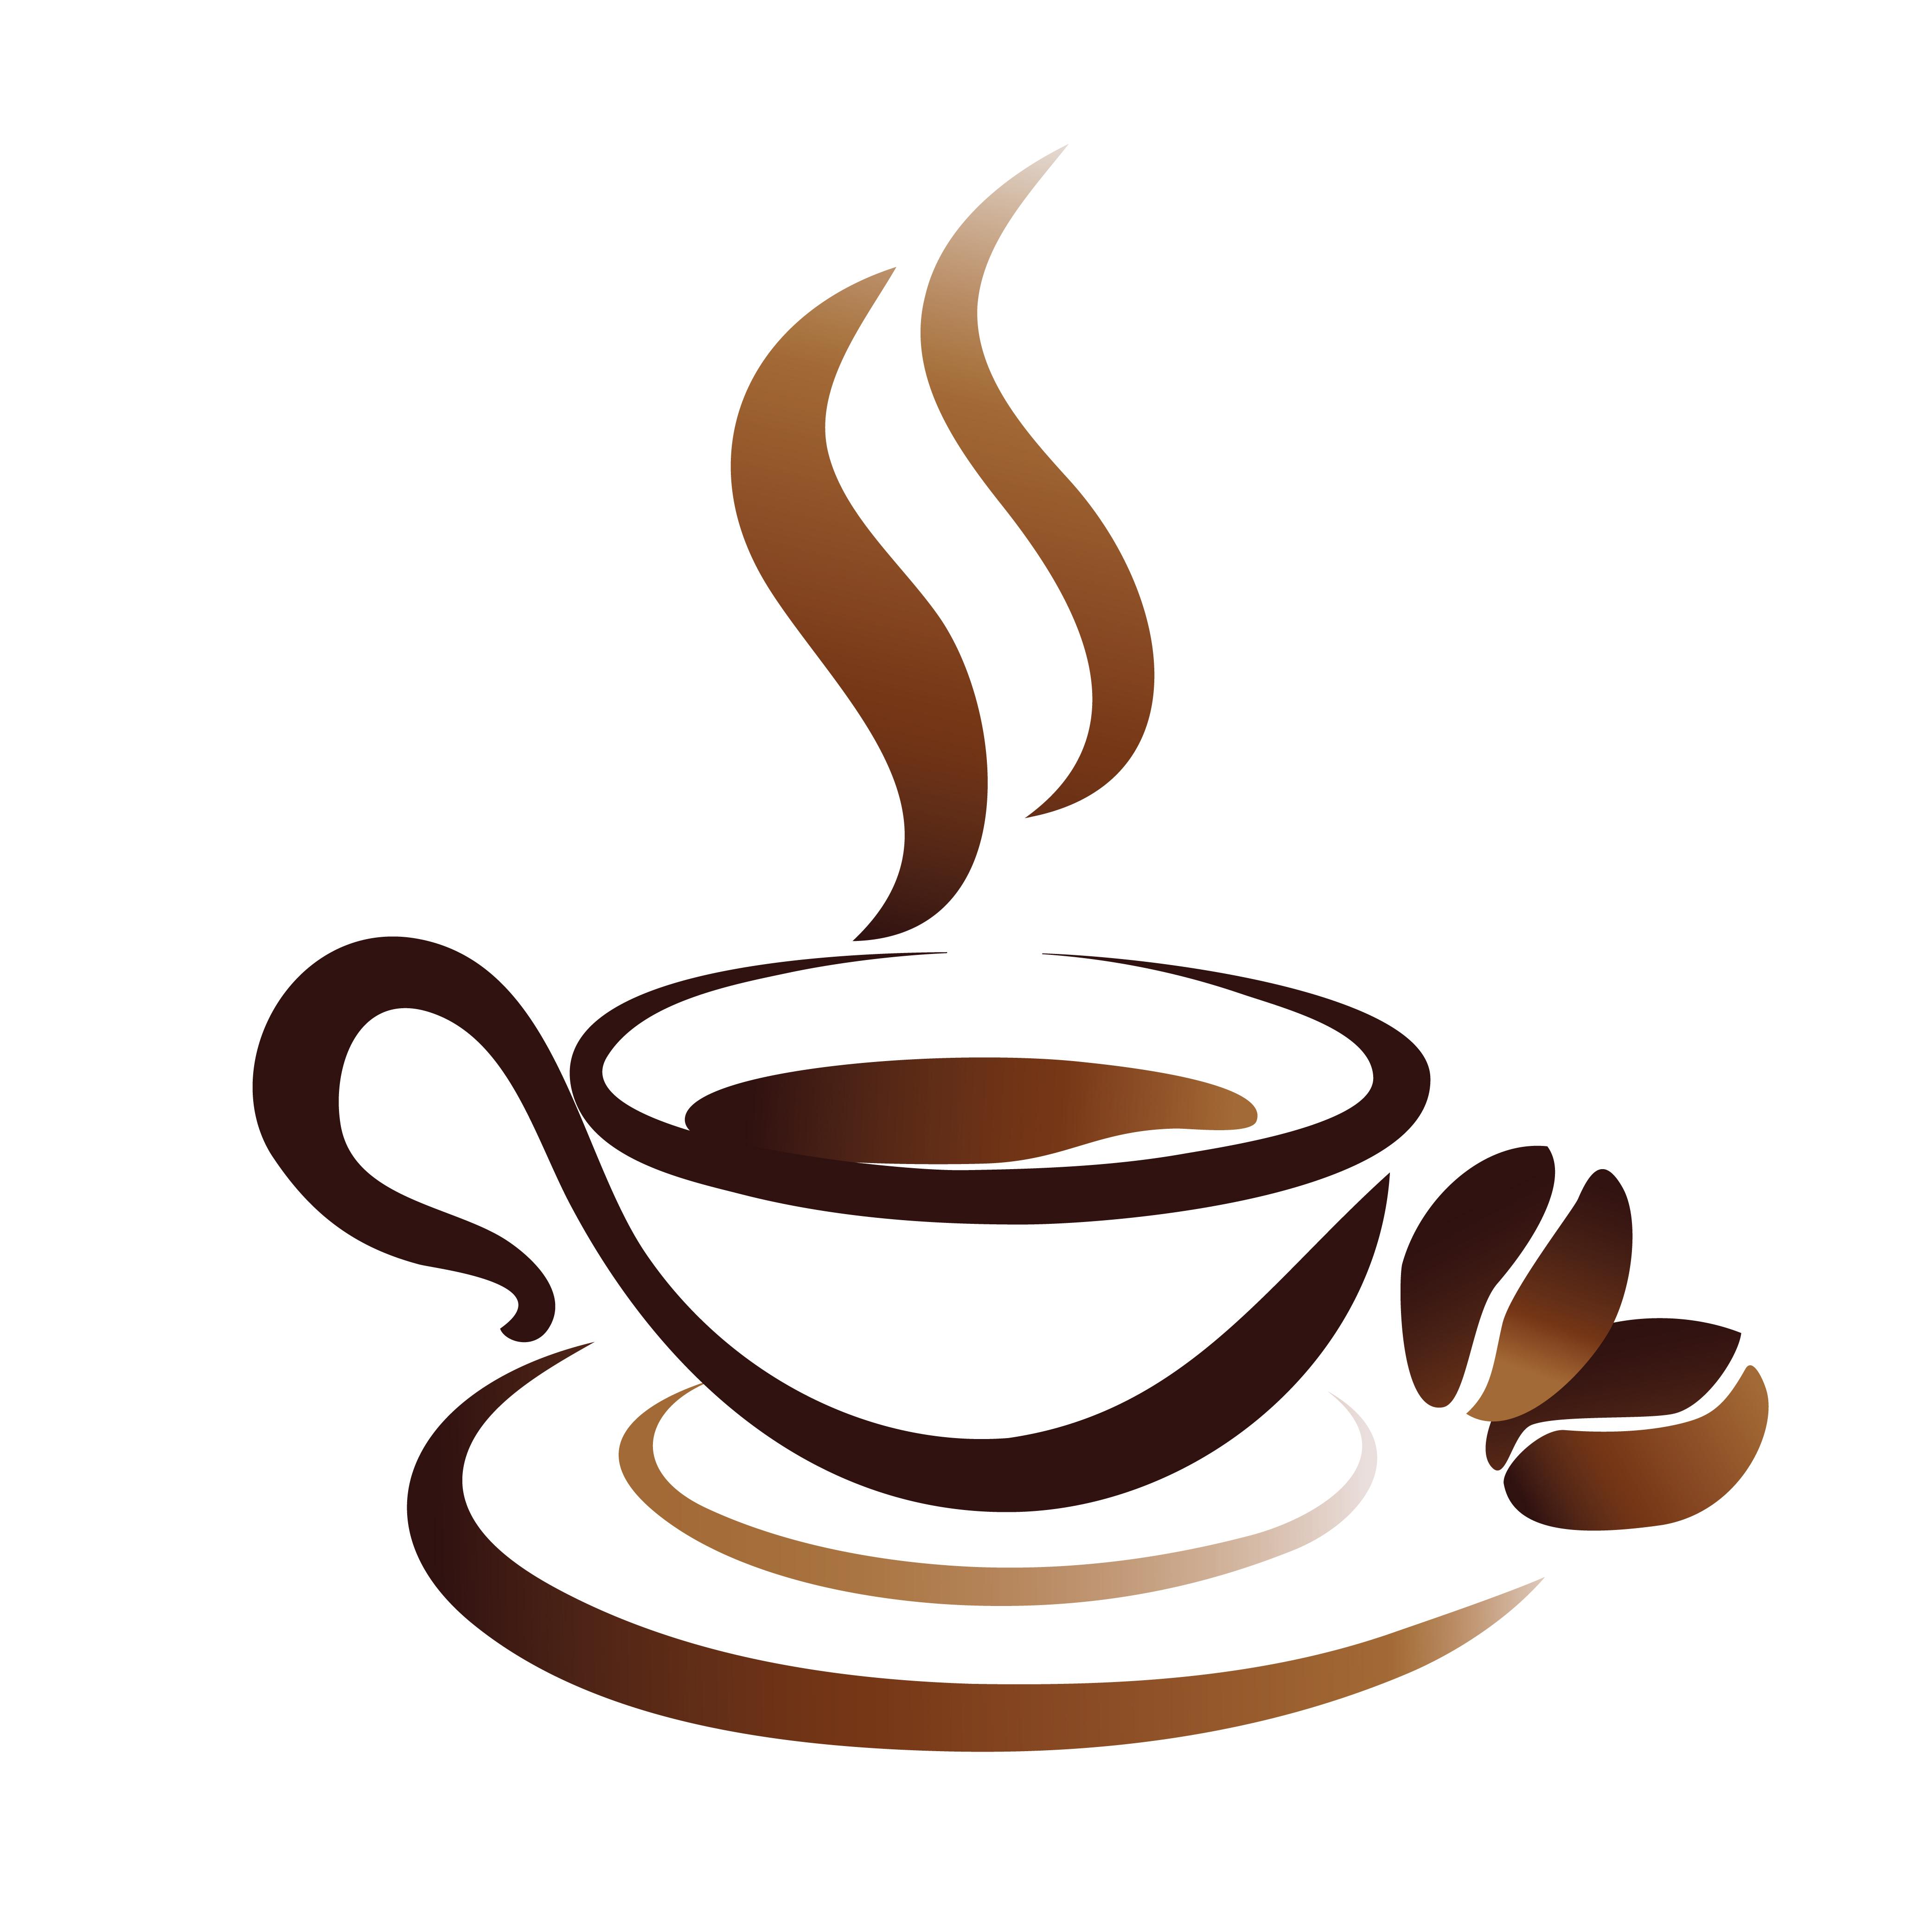 espresso kaffee vertrieb in m u00f6rfelden walldorf fax clipart free fox clipart cartoon